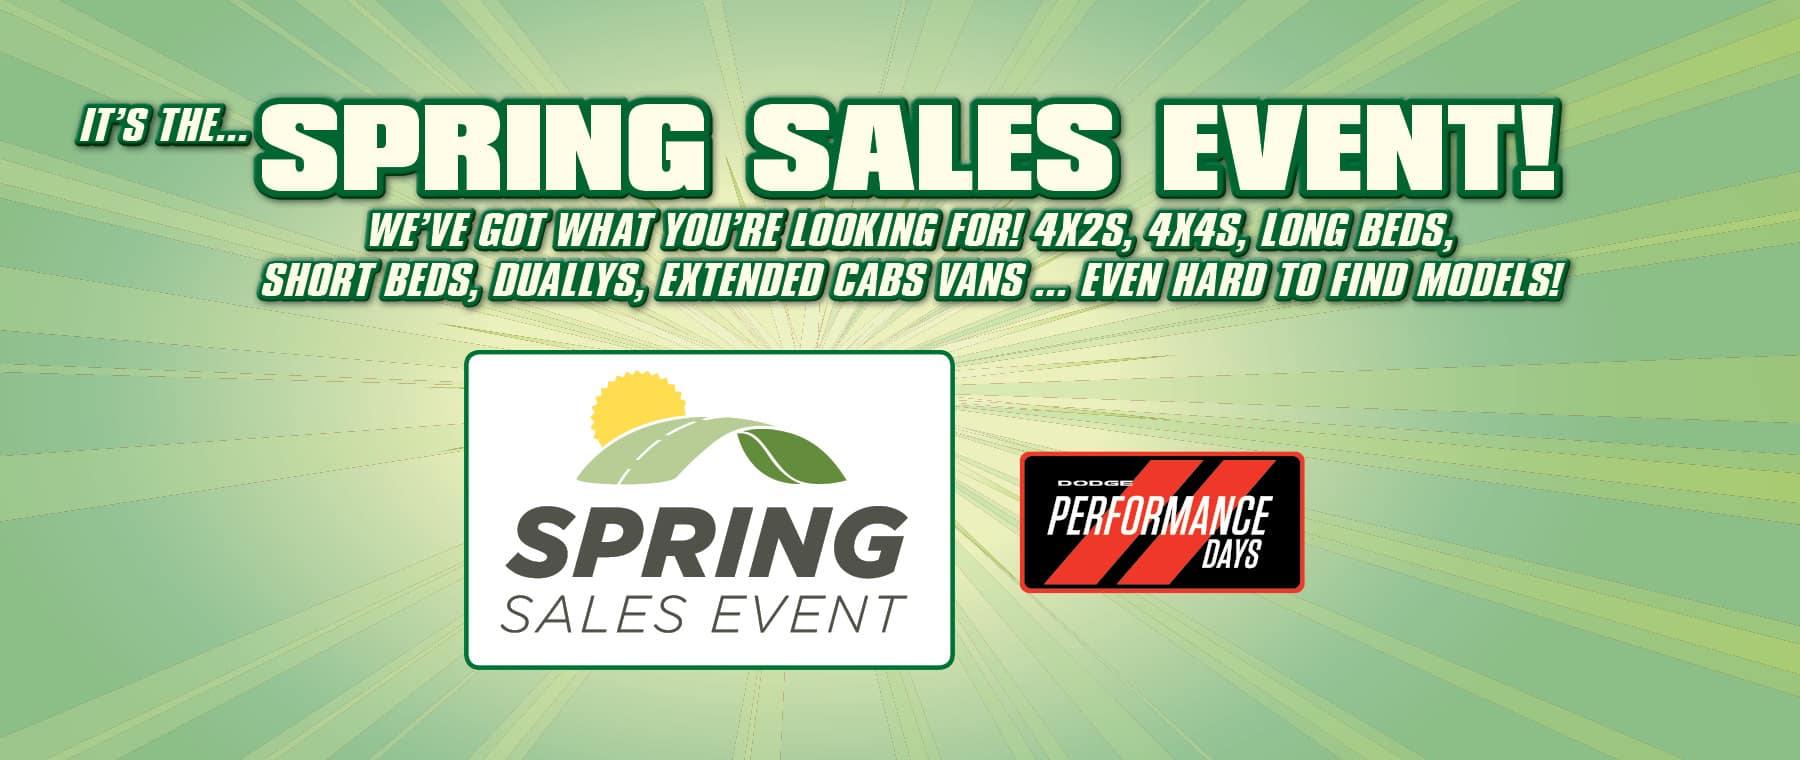 Spring Sales Event! - At University Dodge RAM!